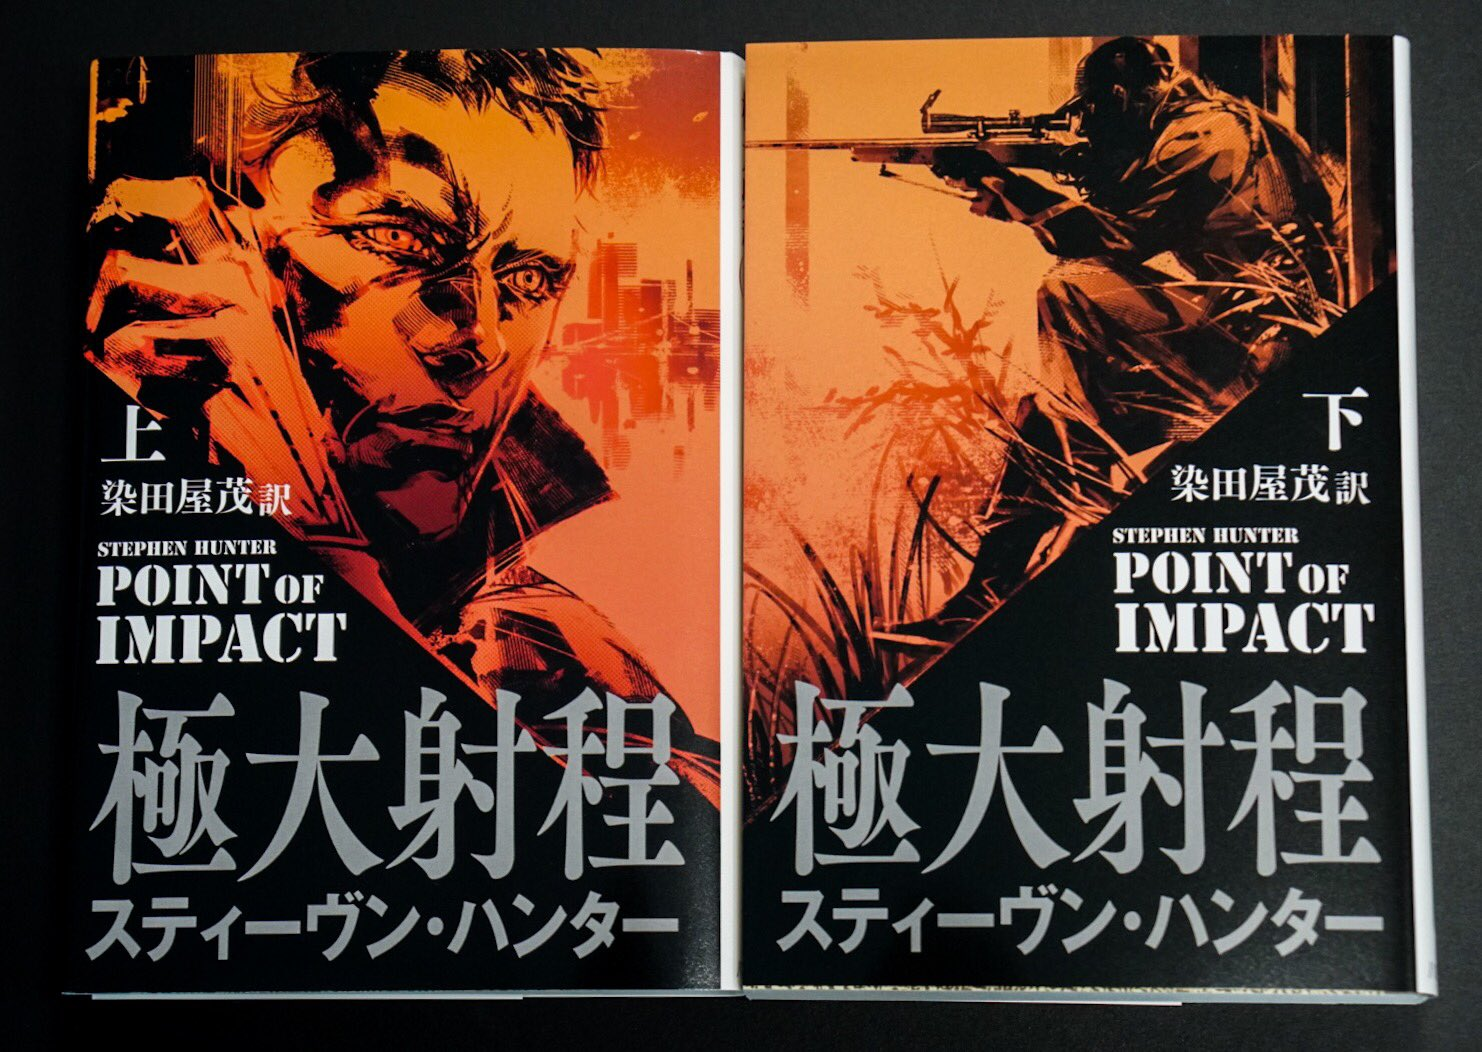 Une illustration inédite de Yoji Shinkawa pour le livre Point of Impact de Stephen Hunter